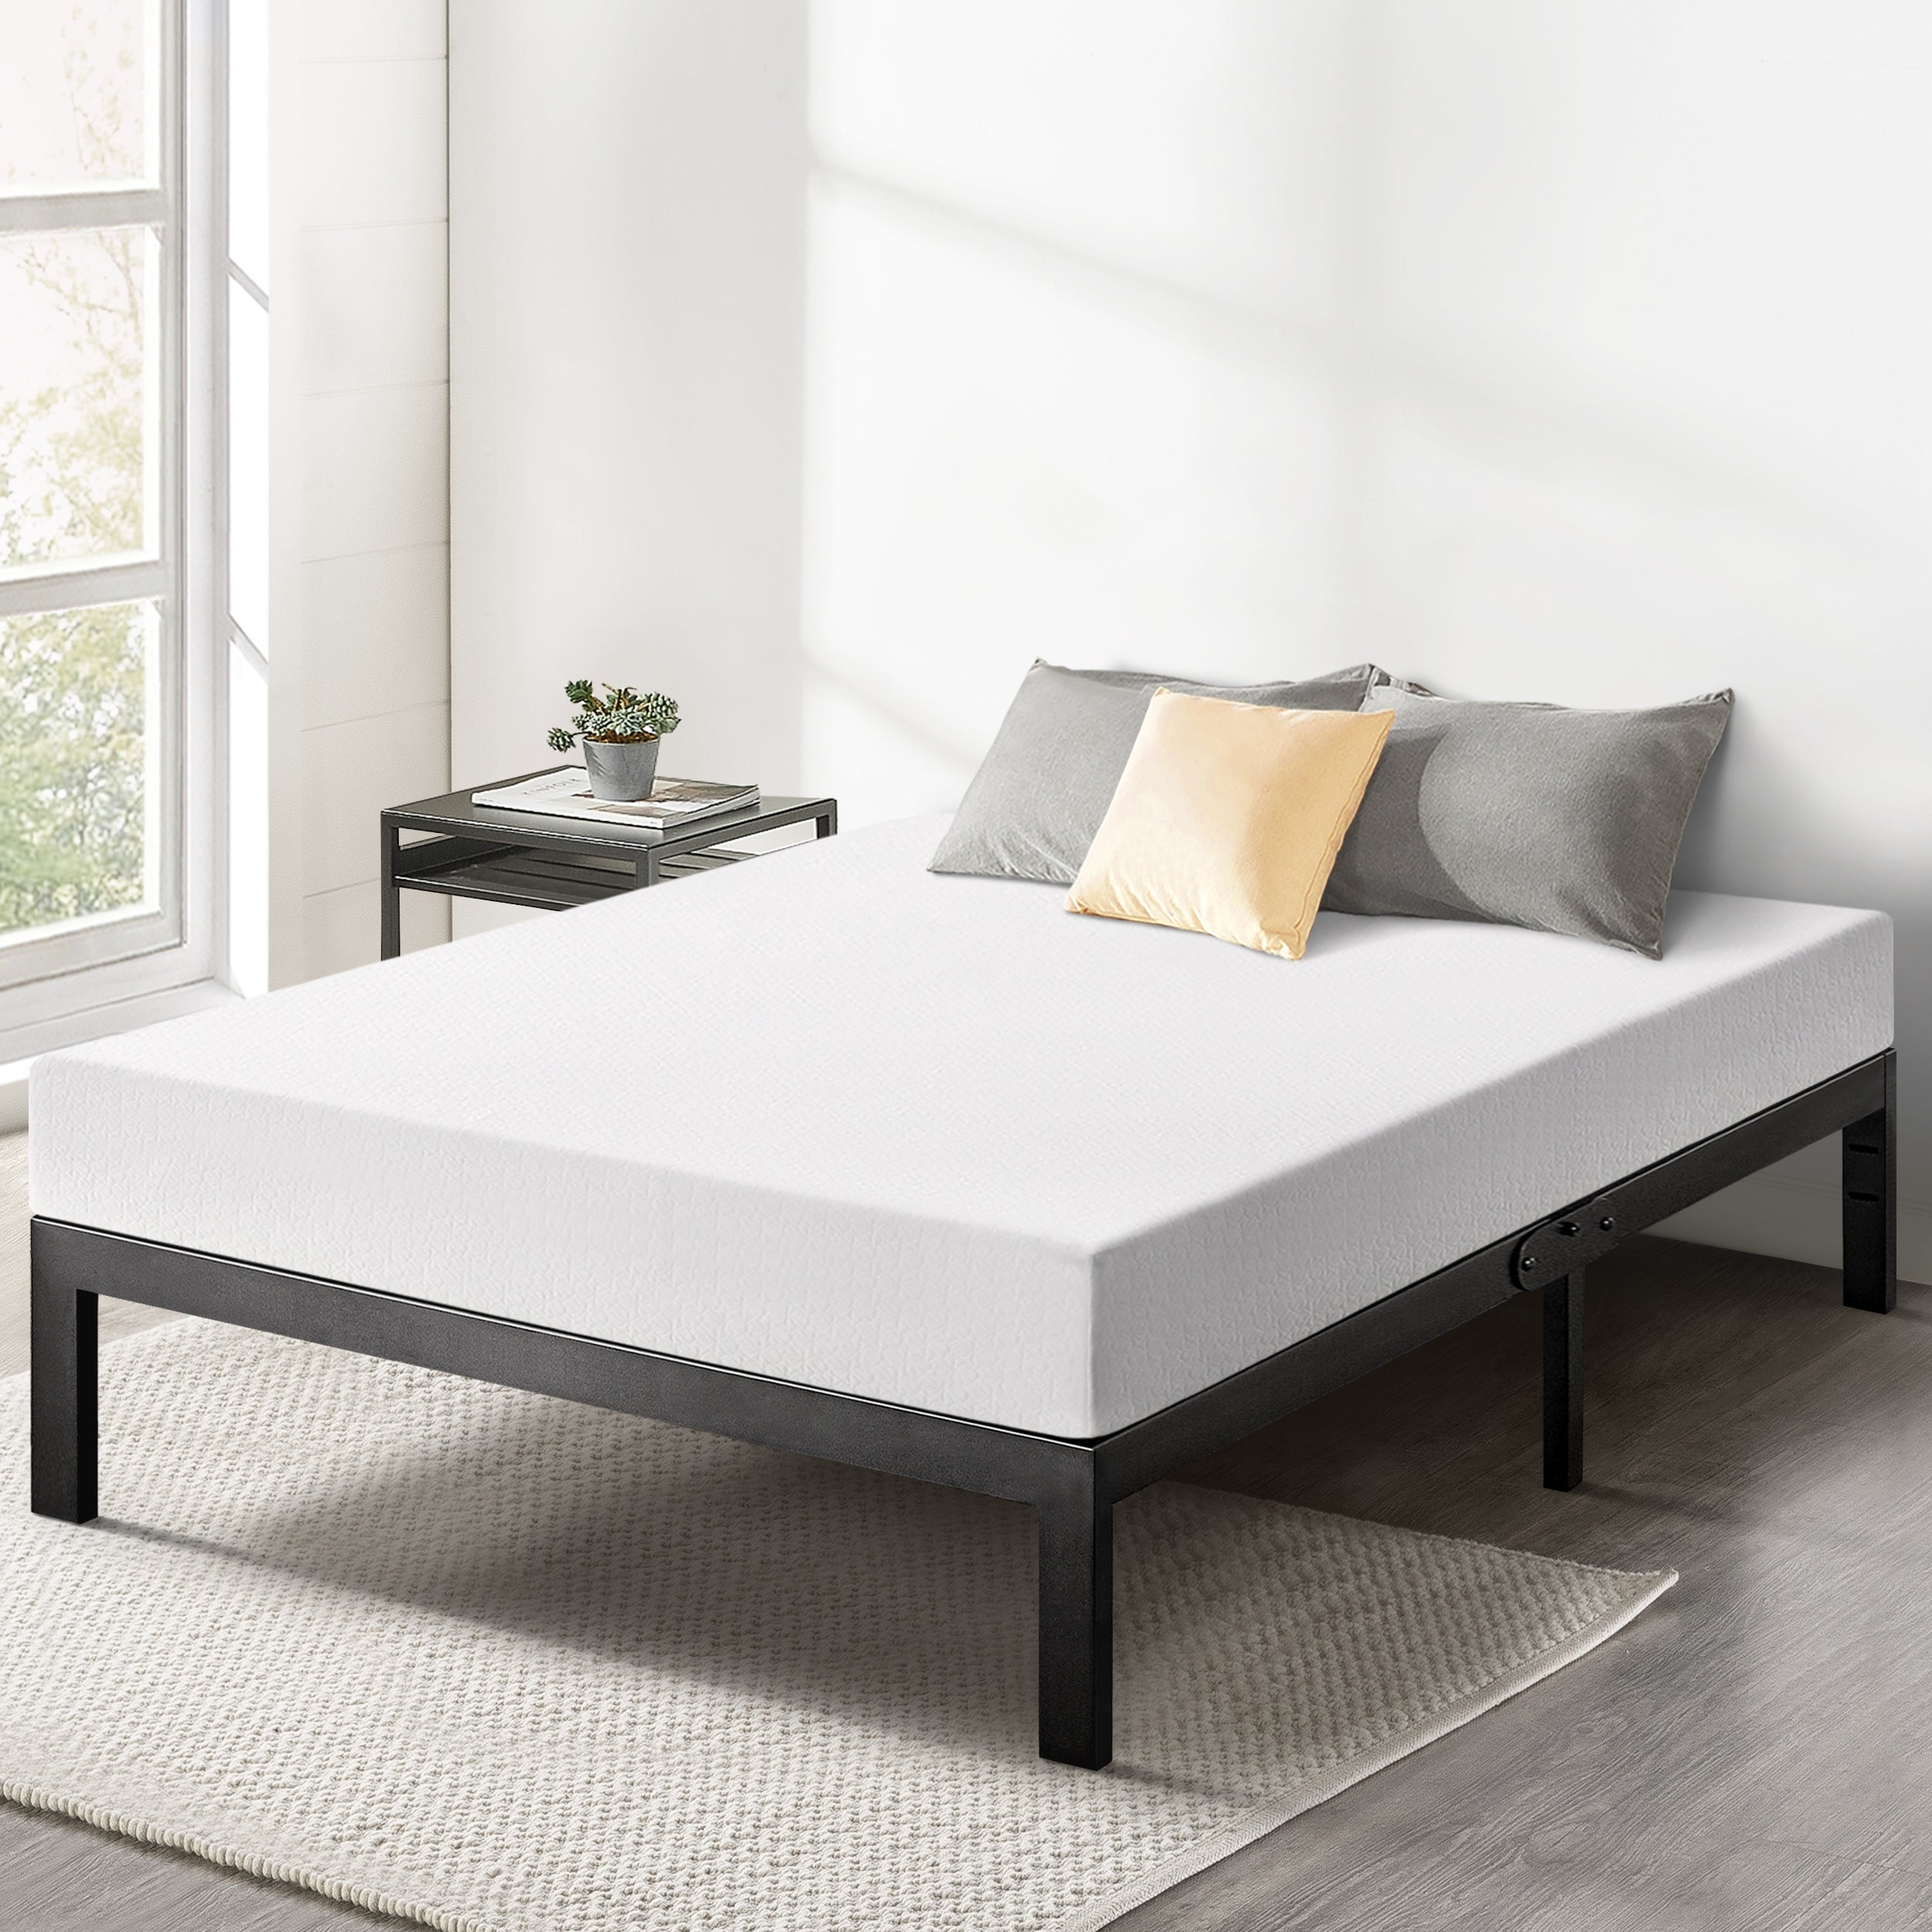 8 Inch Green Tea Memory Foam Mattress And 14 Inch Metal Platform Bed Frame Set Overstock 32887826